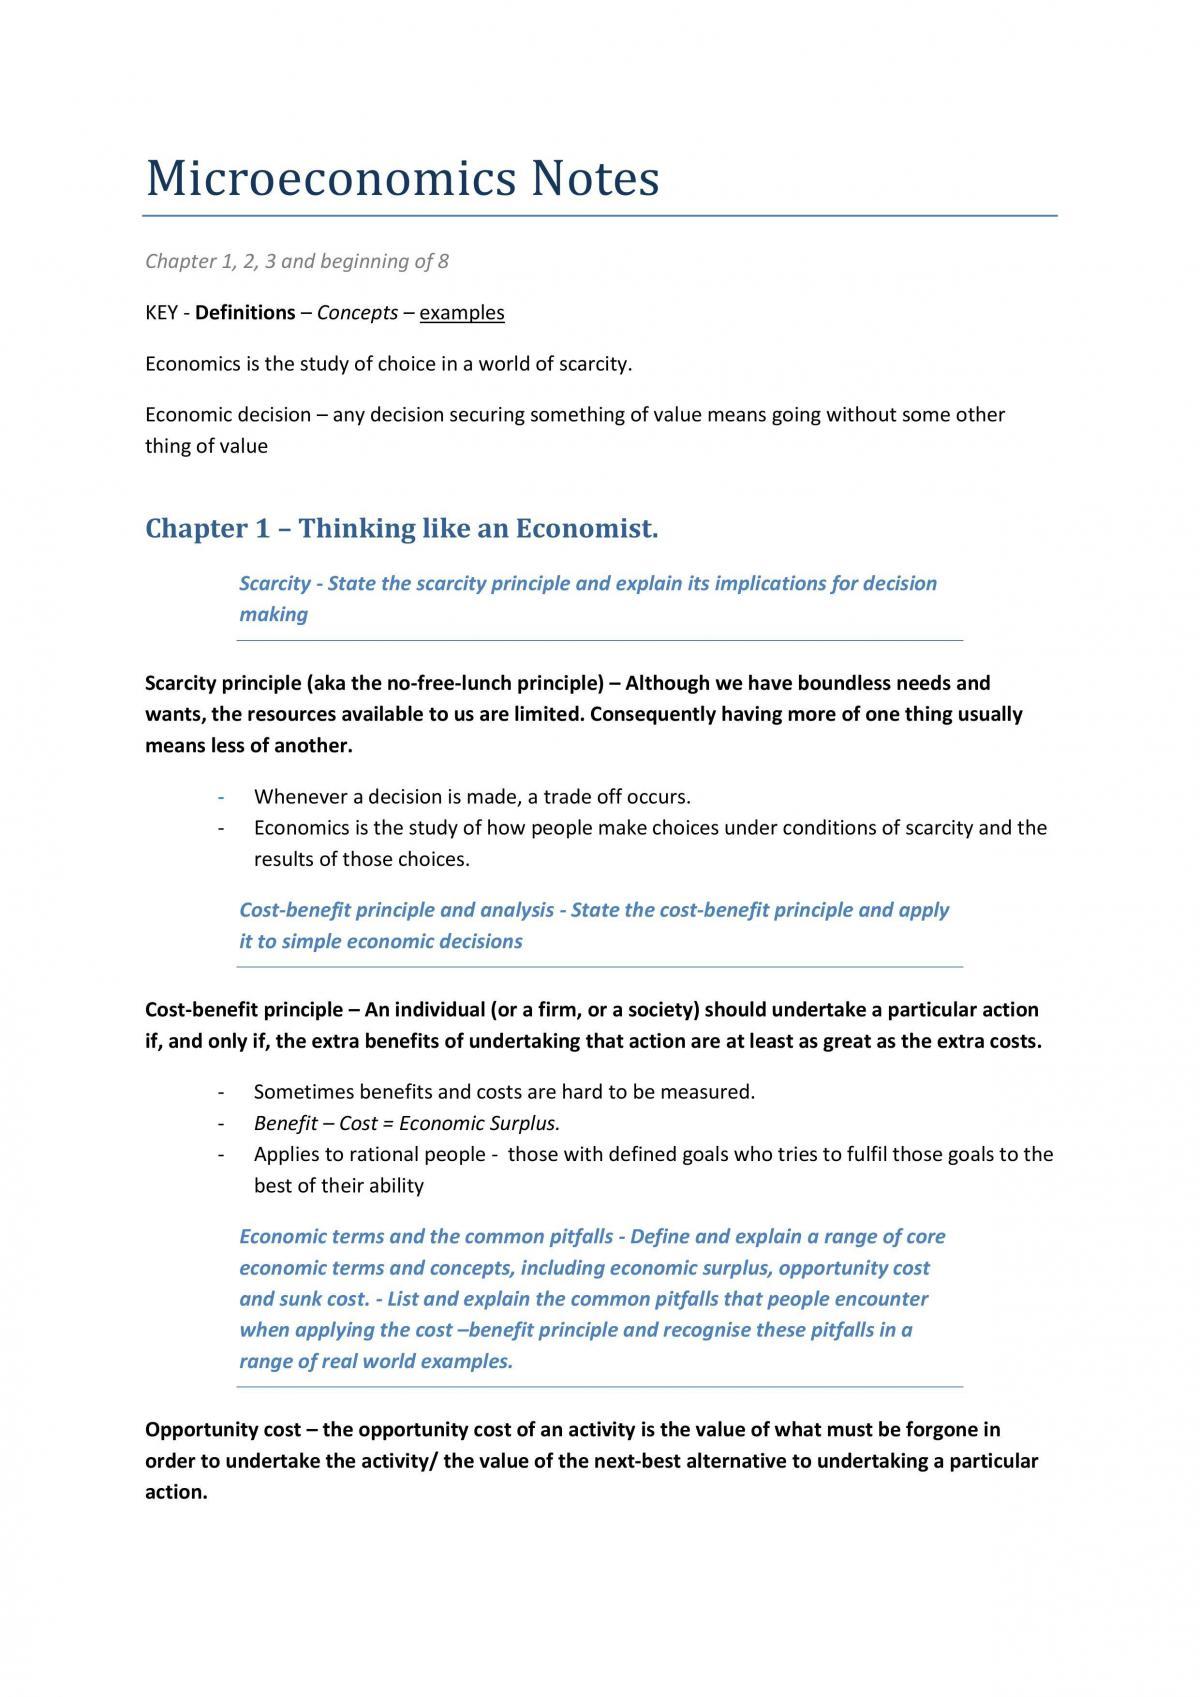 Microeconomics Notes  - Page 1